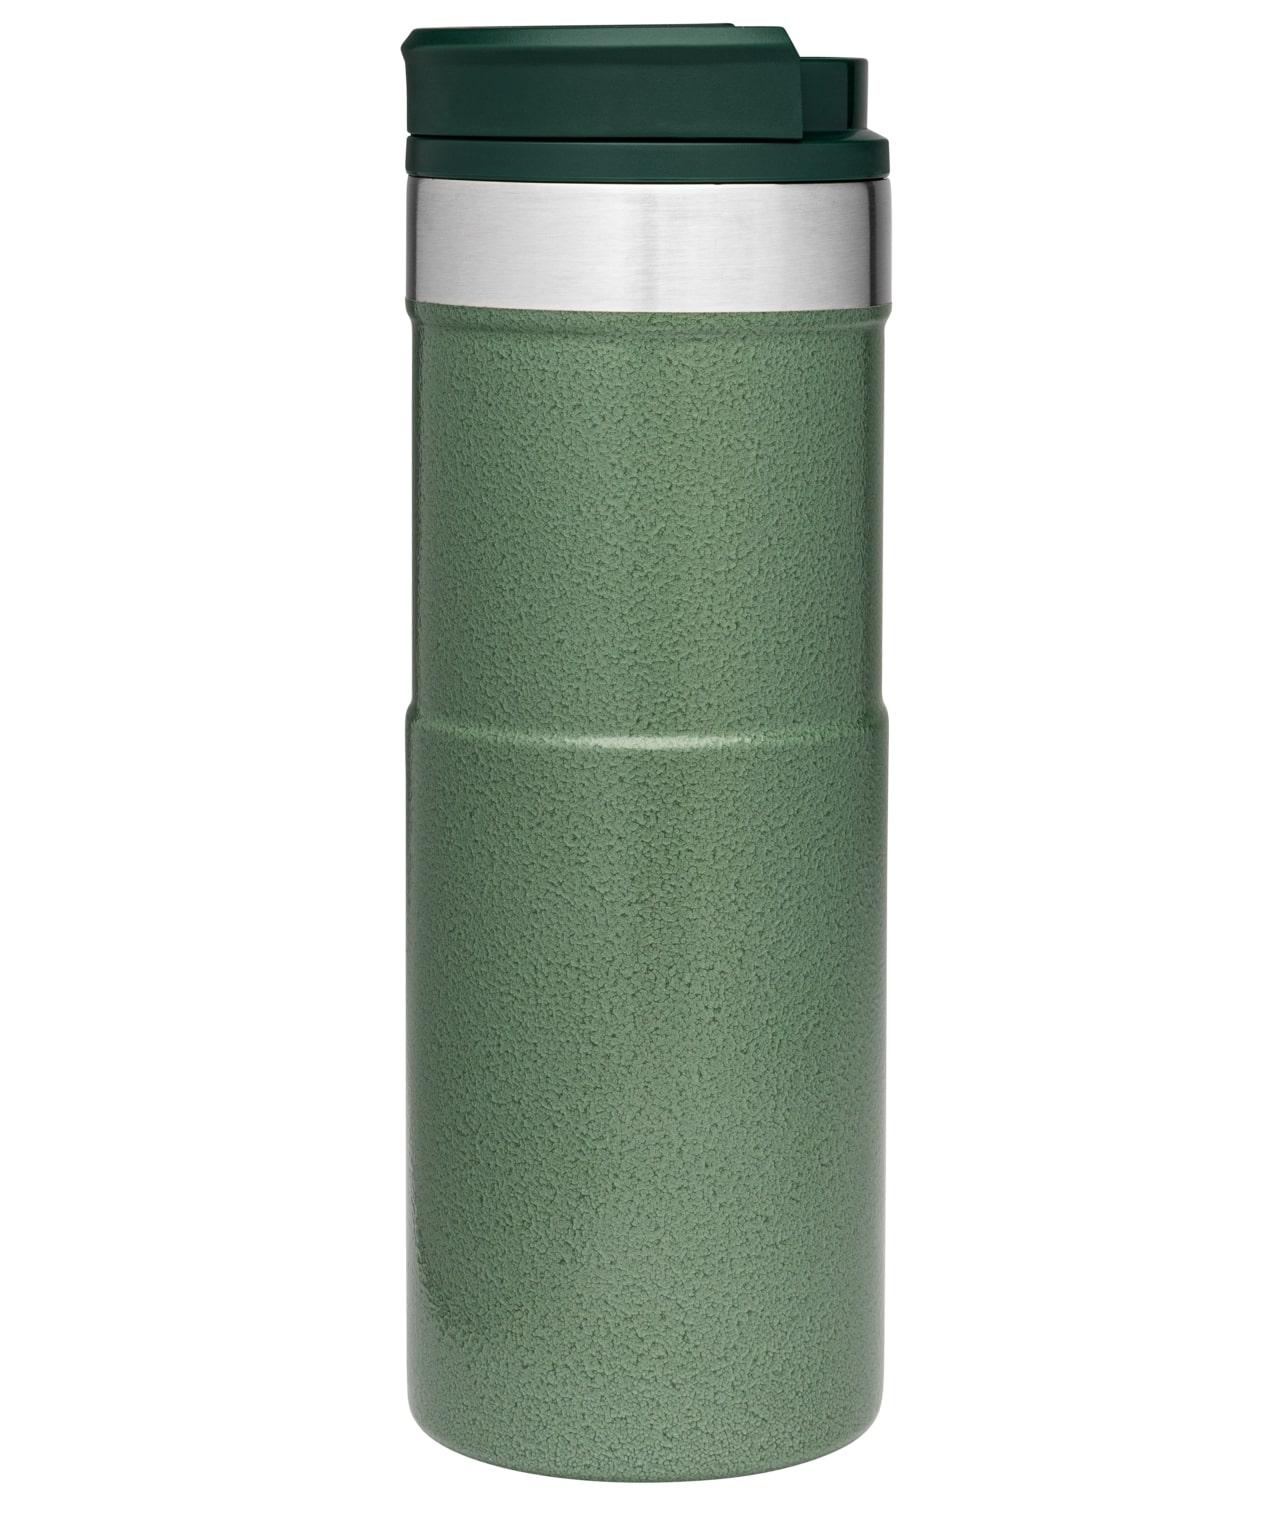 Stanley Classic The NeverLeak Travel Mug 16oz – 0.47L